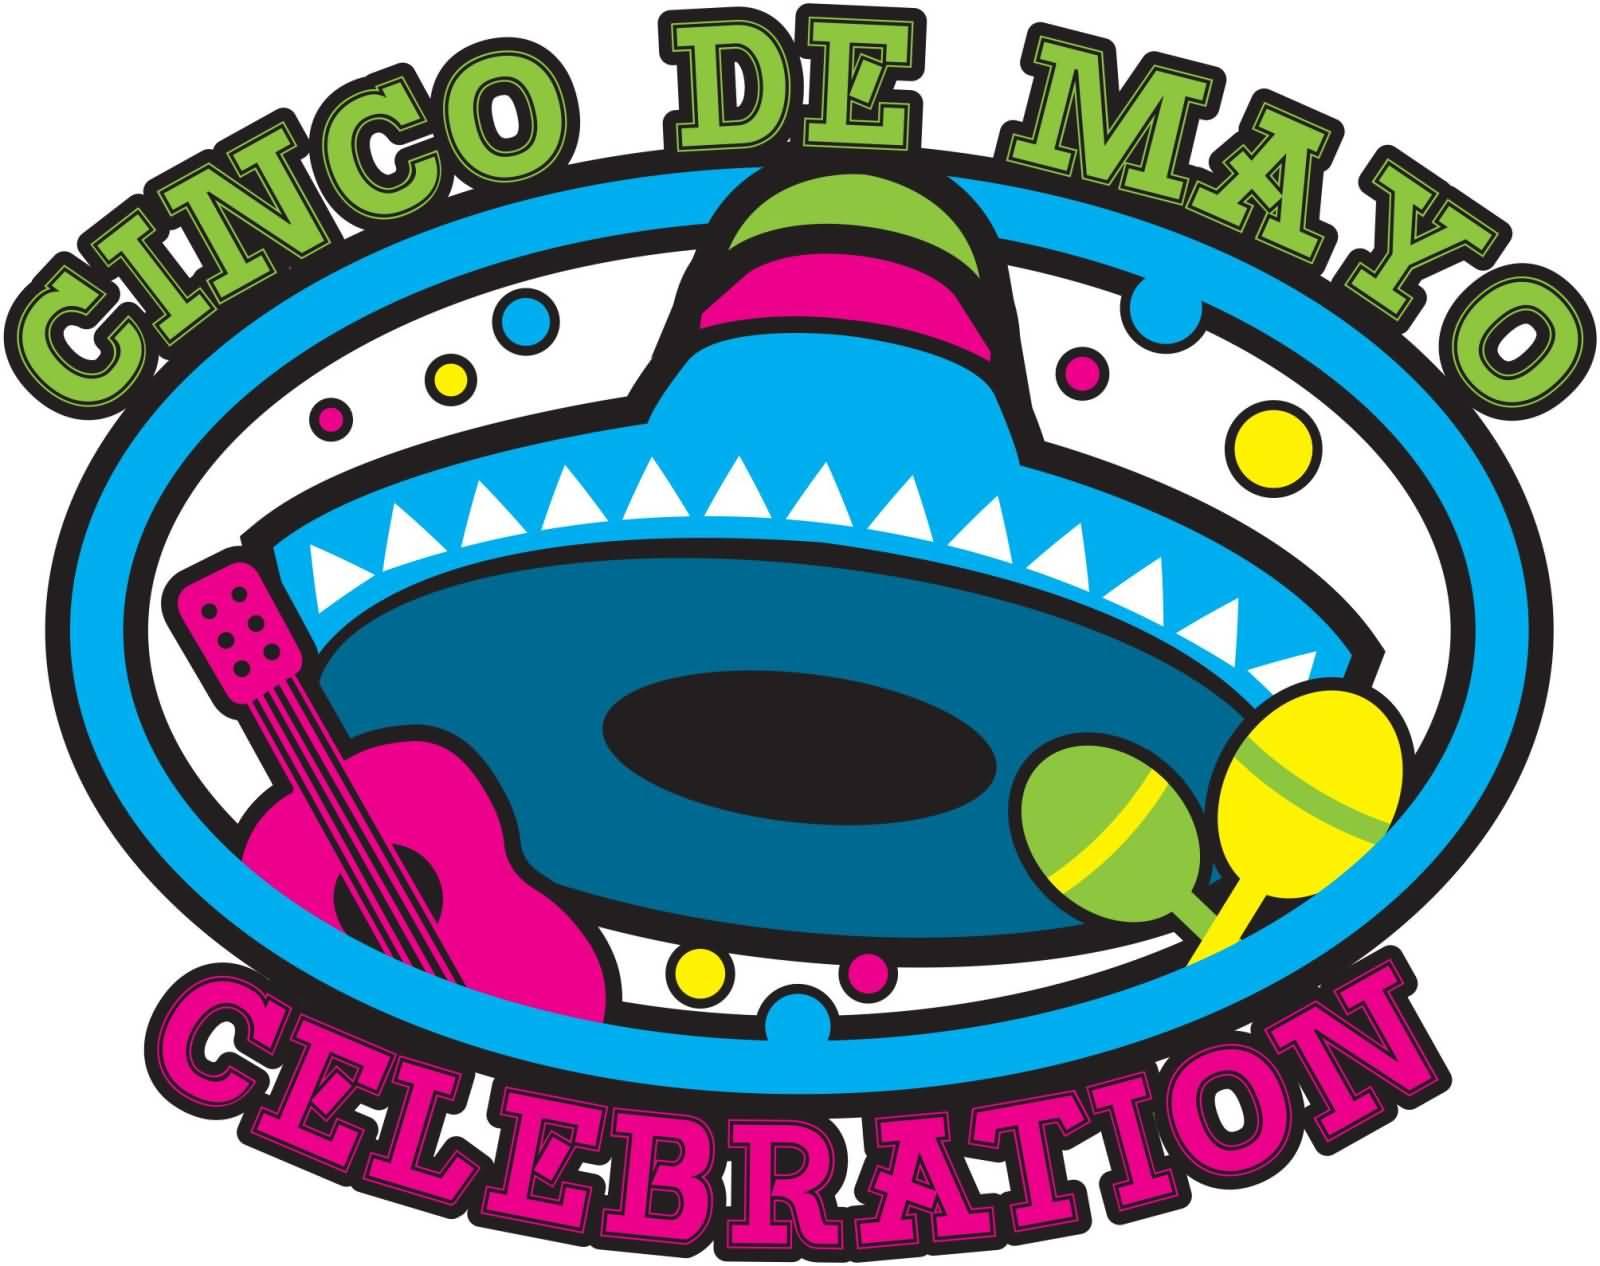 Cinco De Mayo Celebration Clipart.